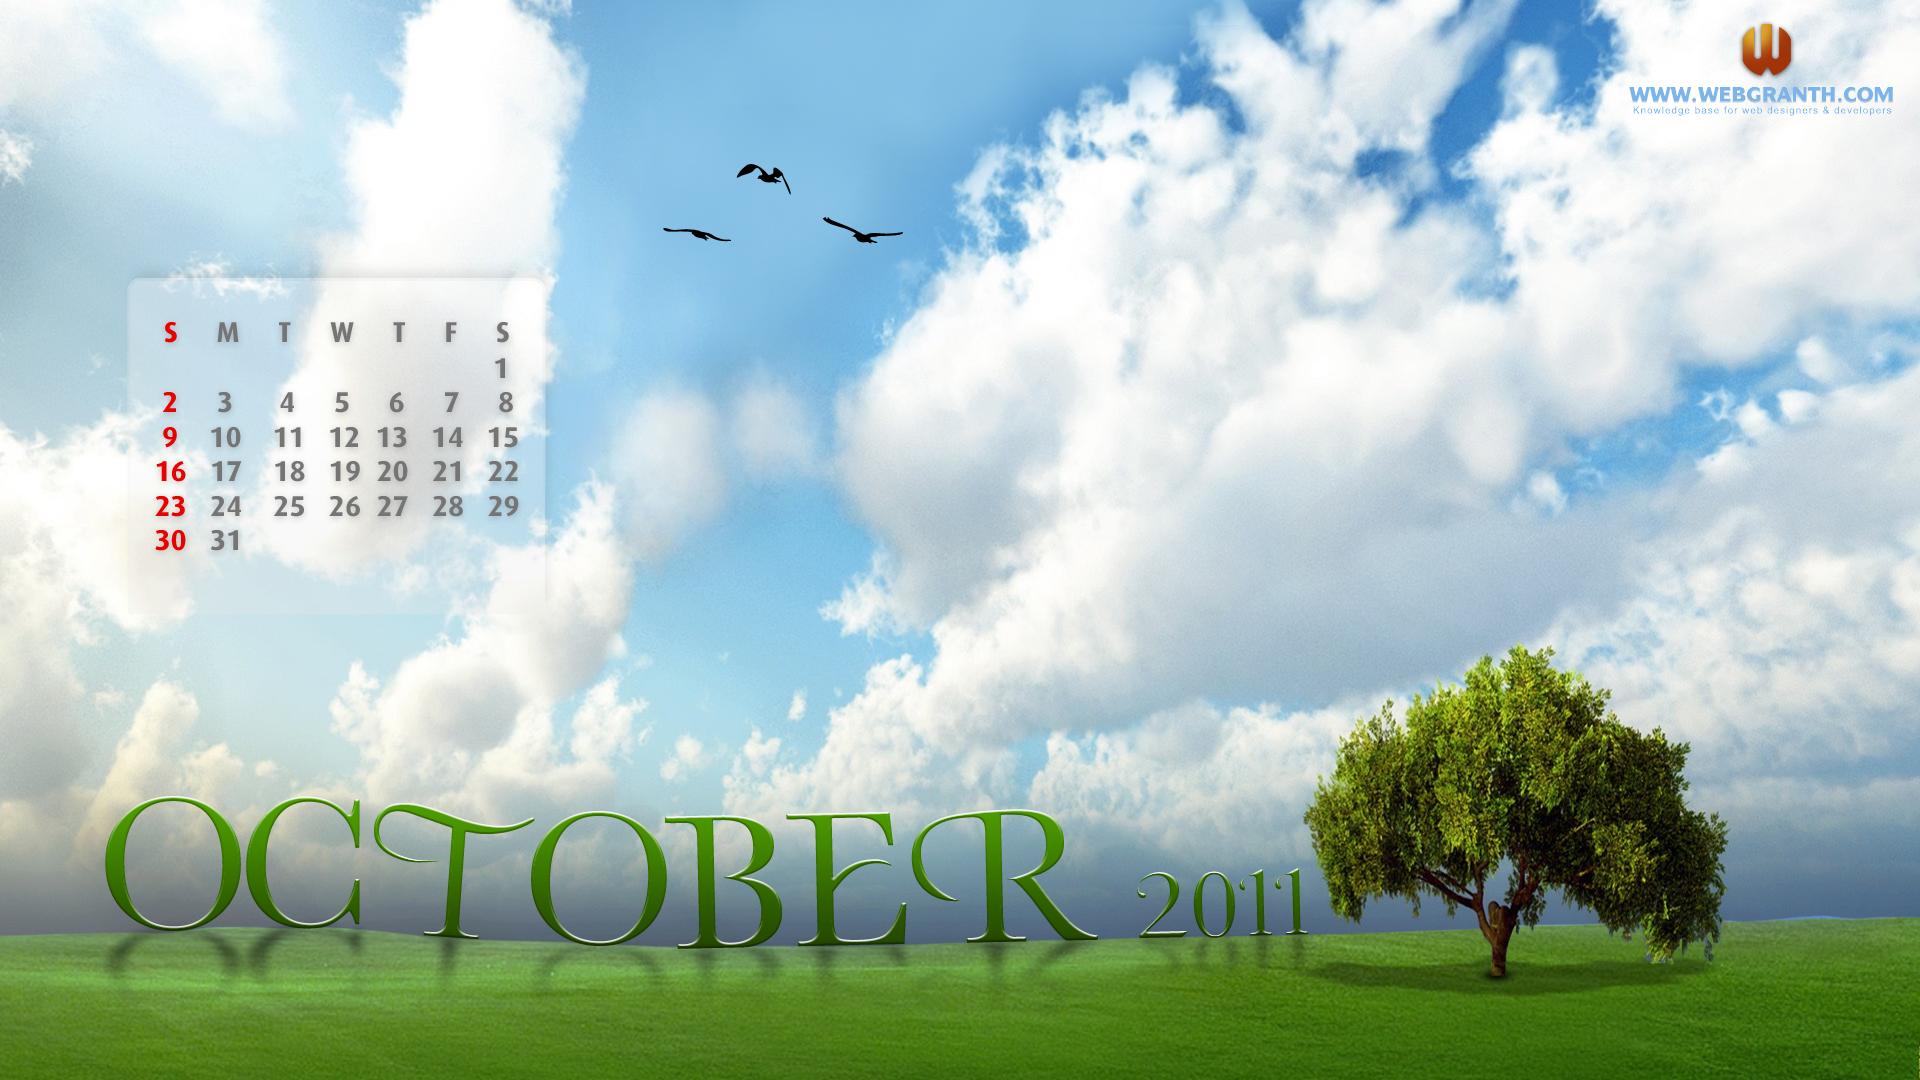 Desktop Calendar Wallpaper October 2011 Download   Webgranth 2015 1920x1080